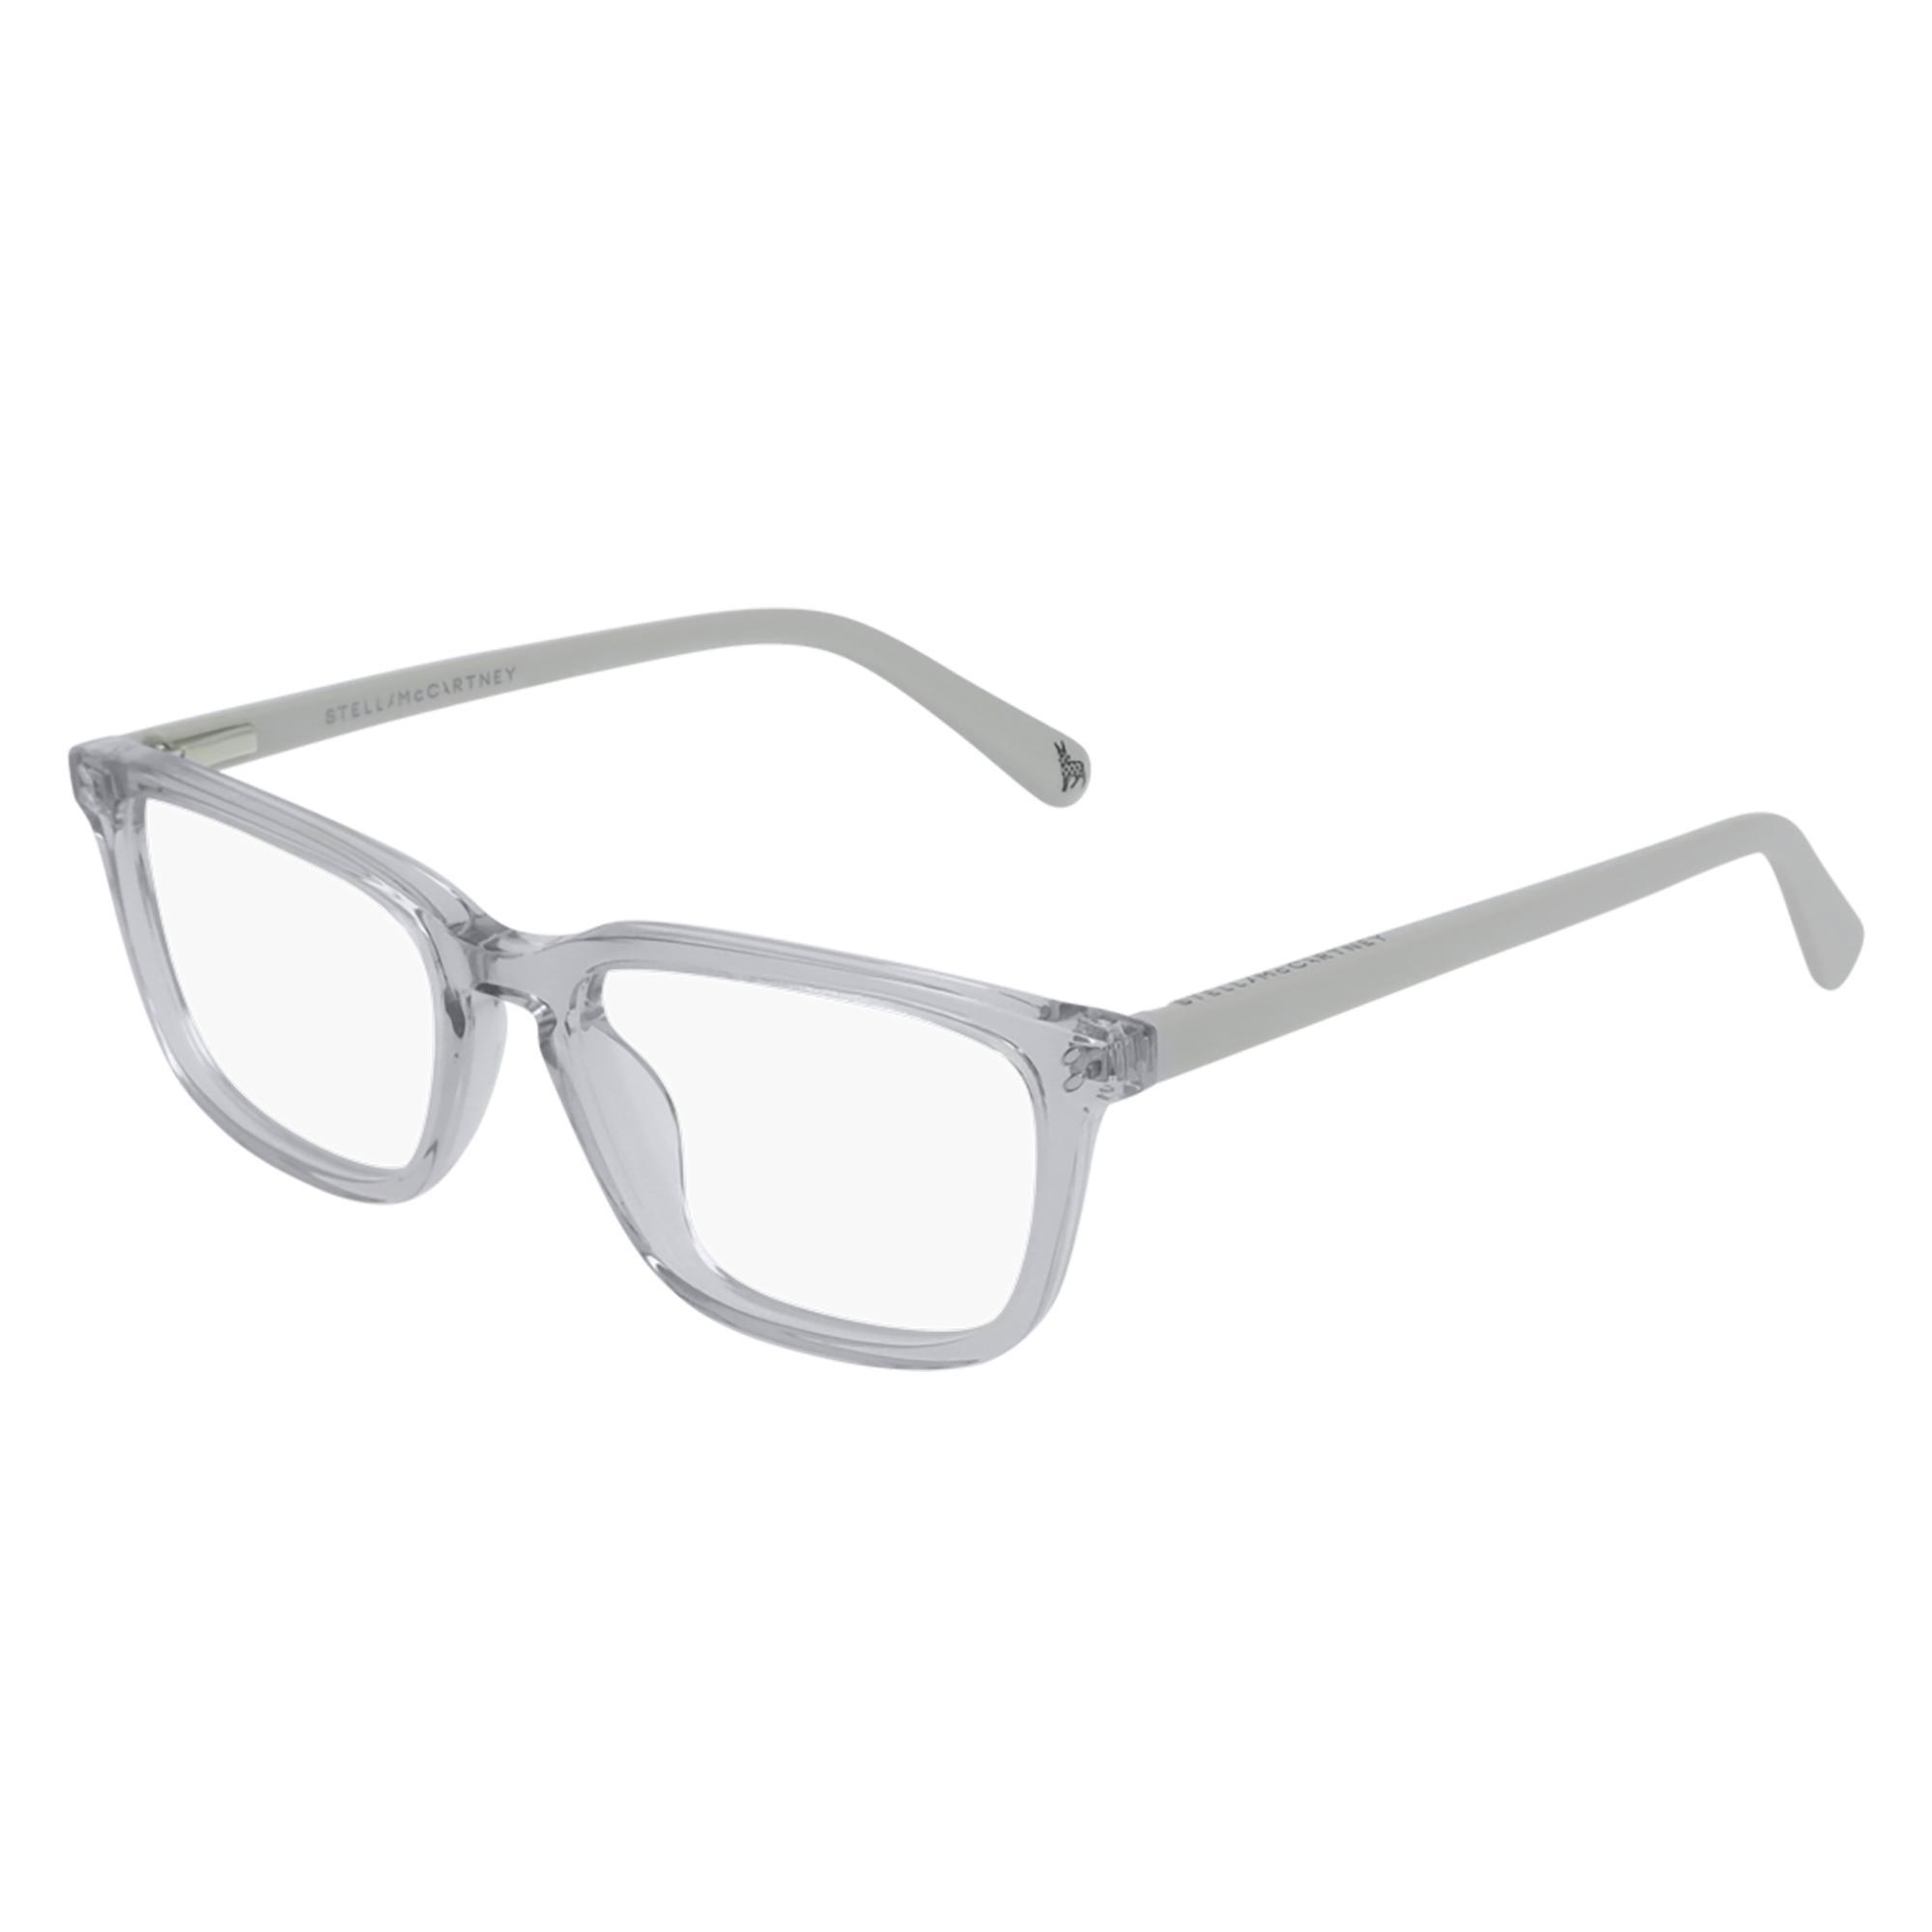 003 grey grey transparent